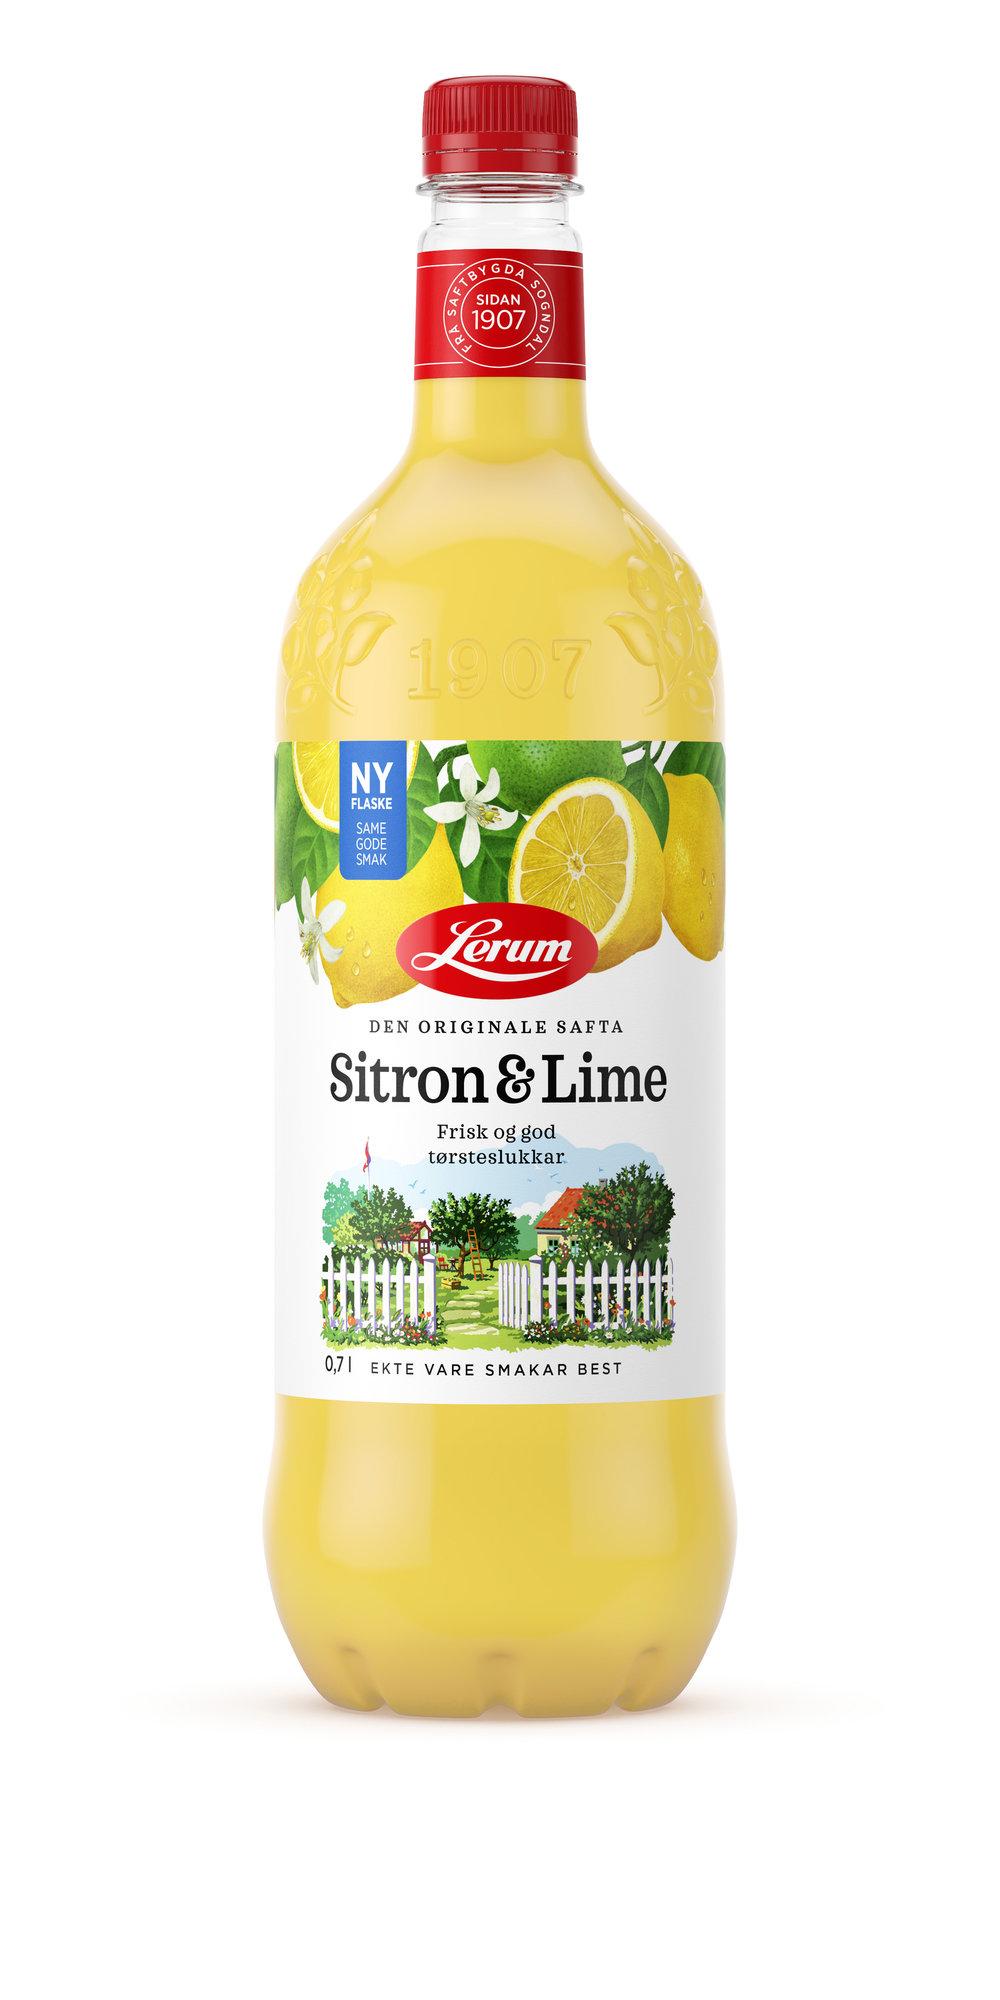 Sitron & Lime 0,7.jpg